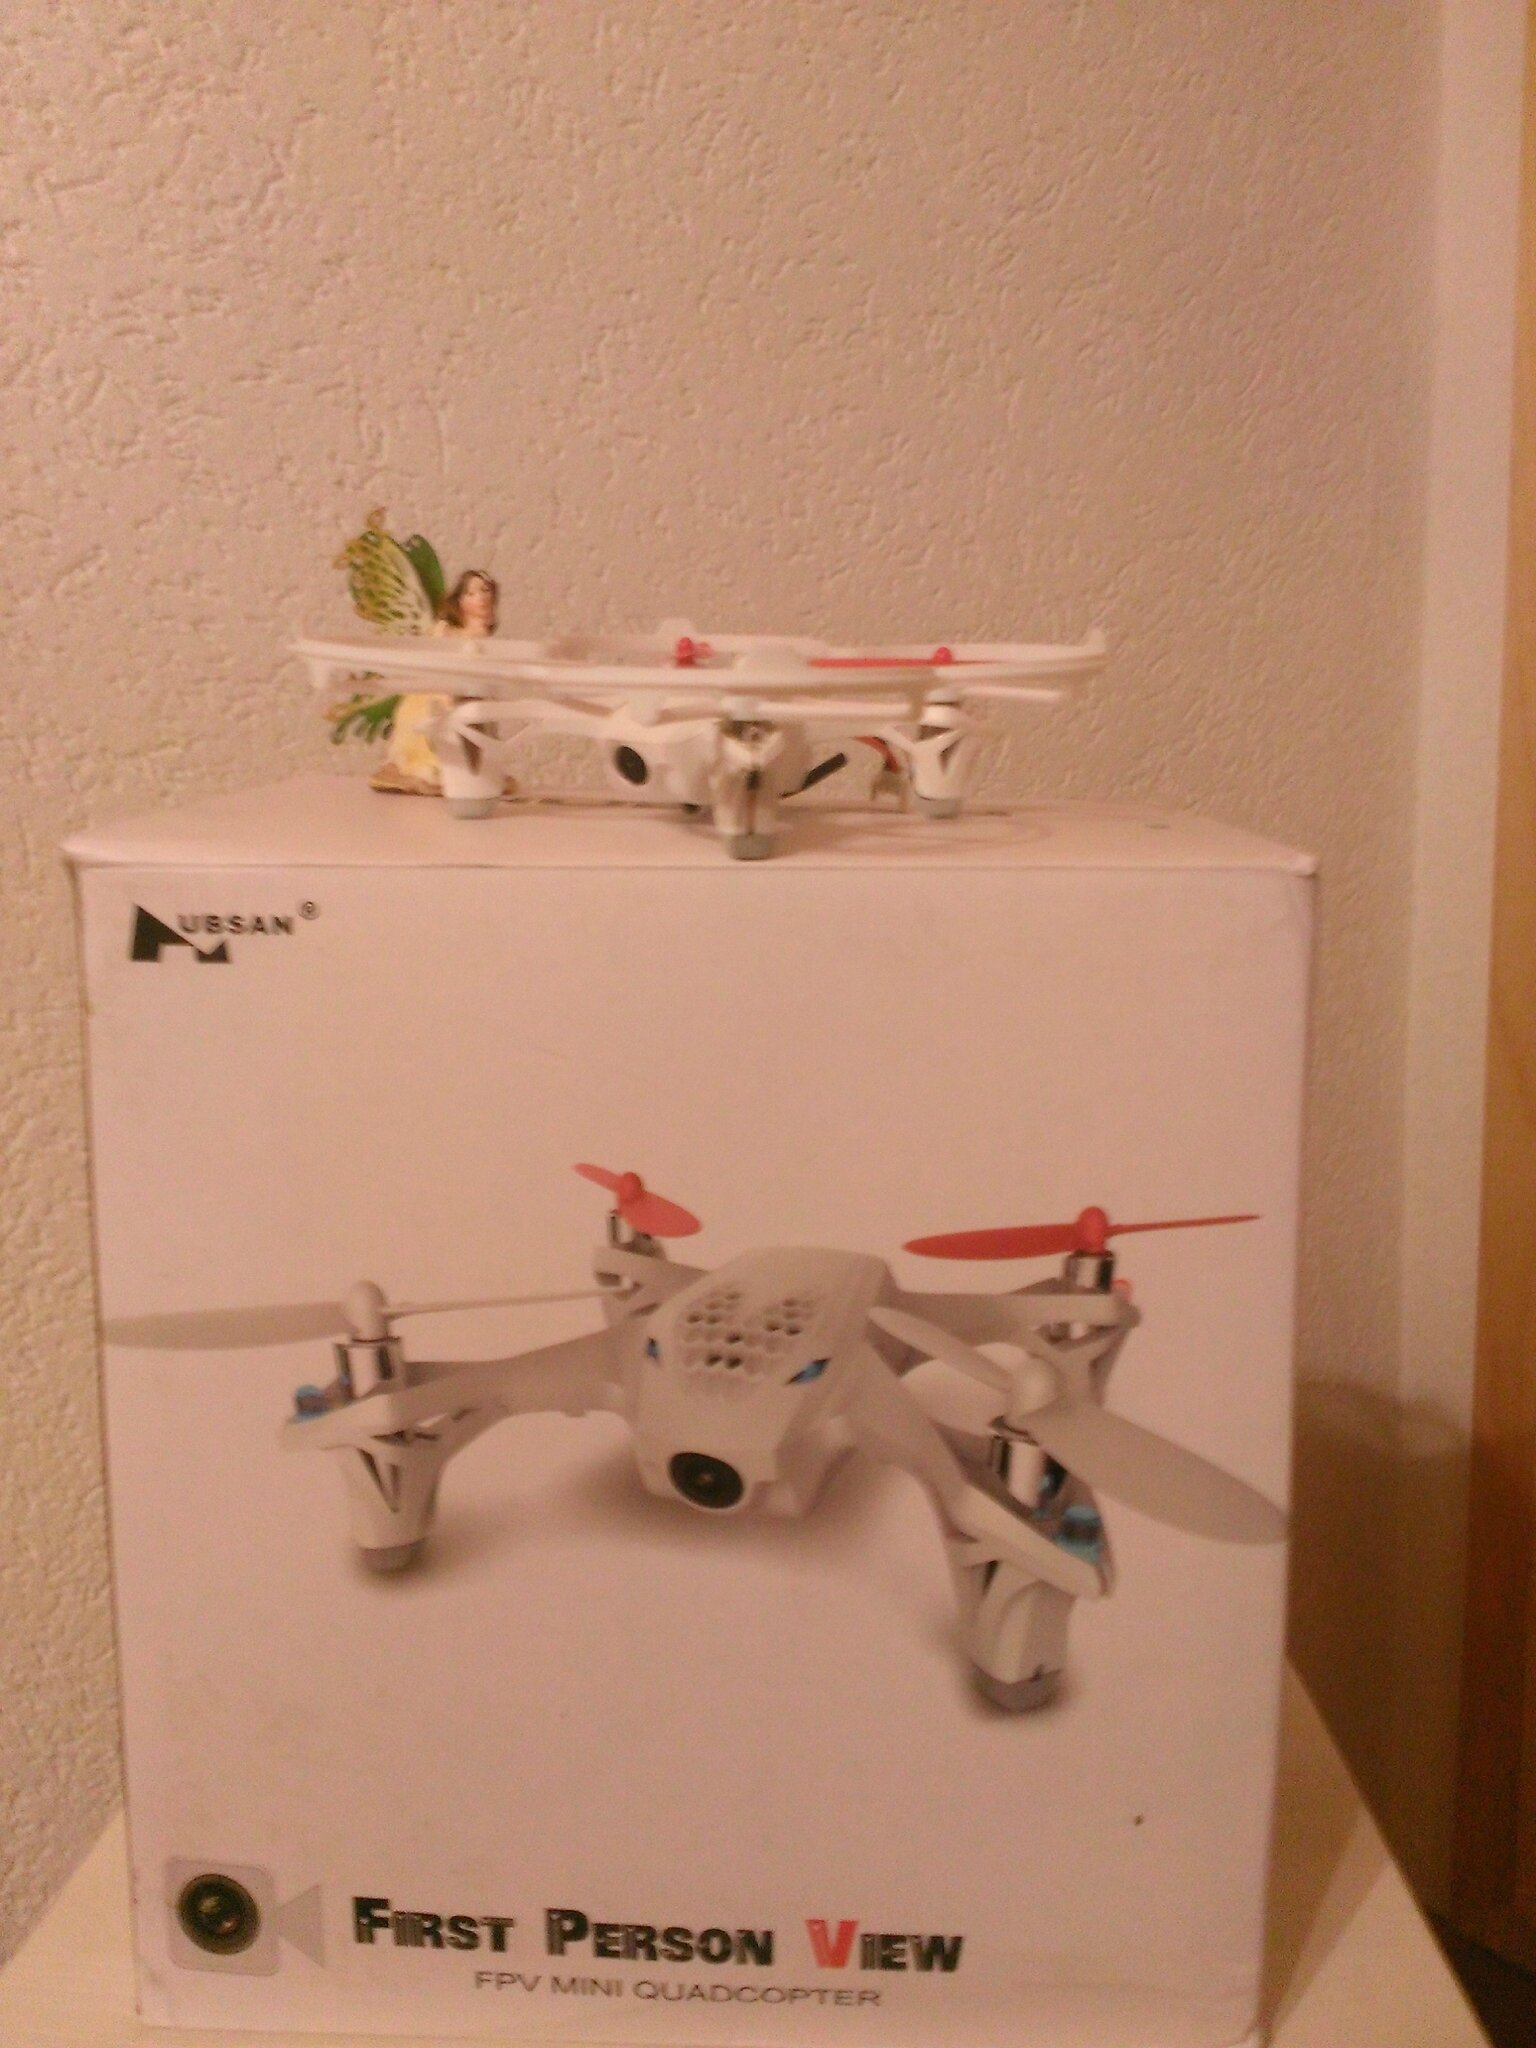 Drony sur sa boite ;-)